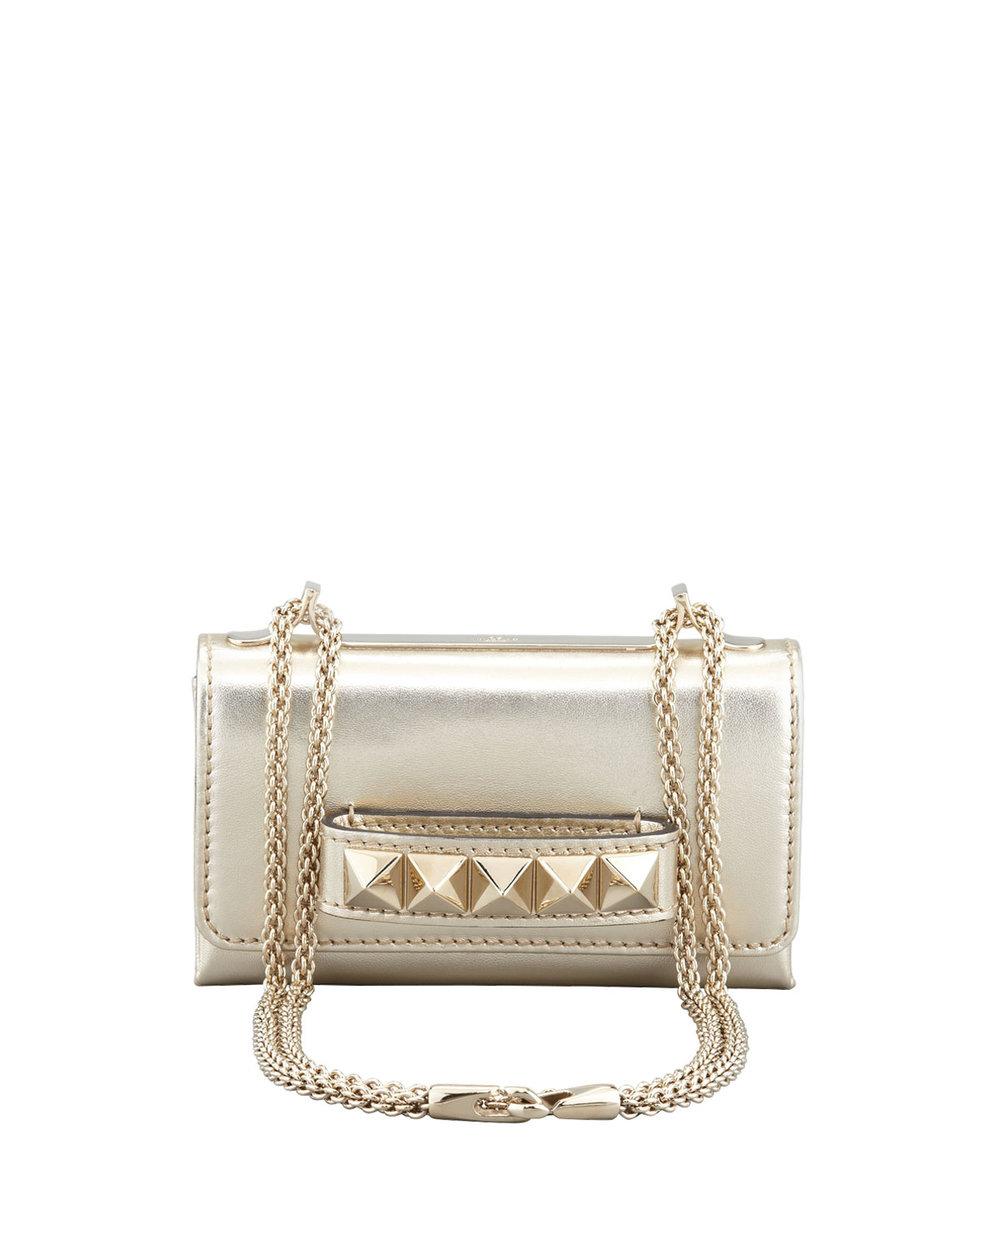 valentino-gold-va-va-voom-metallic-mini-bag-product-1-14577680-0-407474672-normal.jpeg